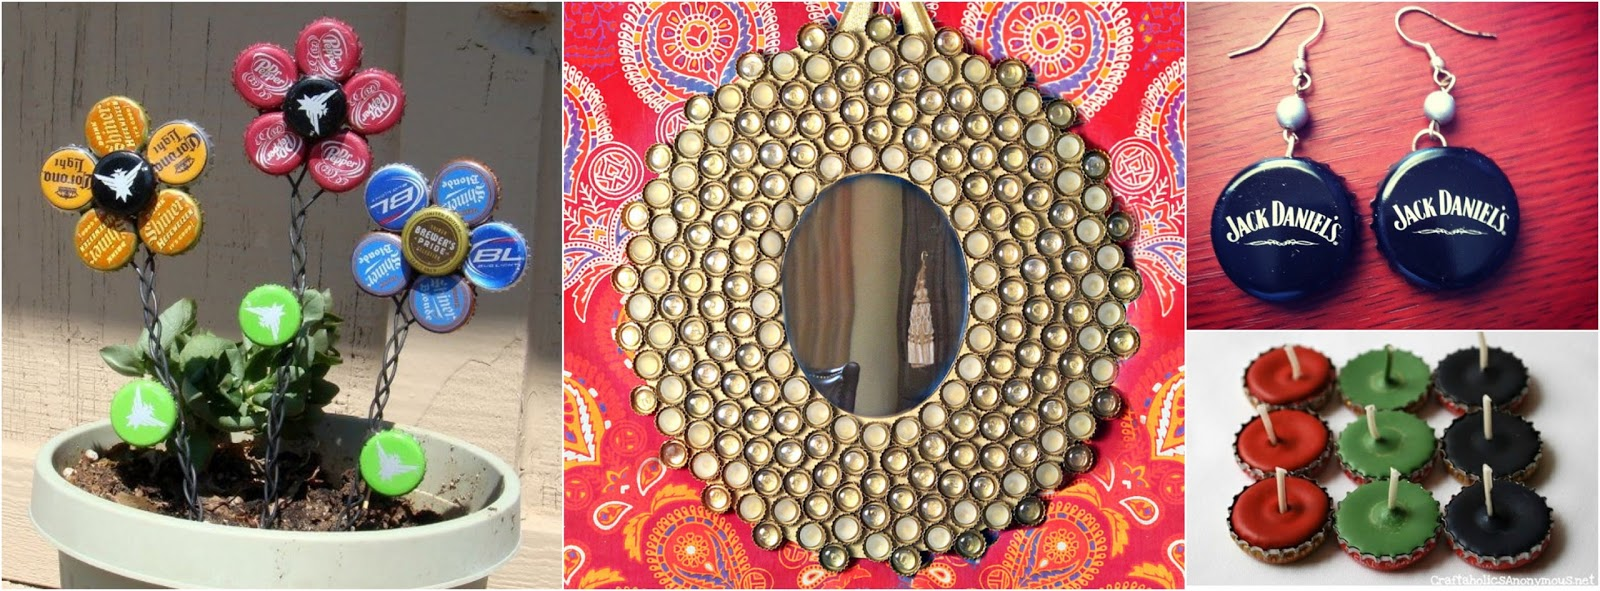 9 manualidades para reciclar corcholatas de botellas en - Manualidades de casa ...